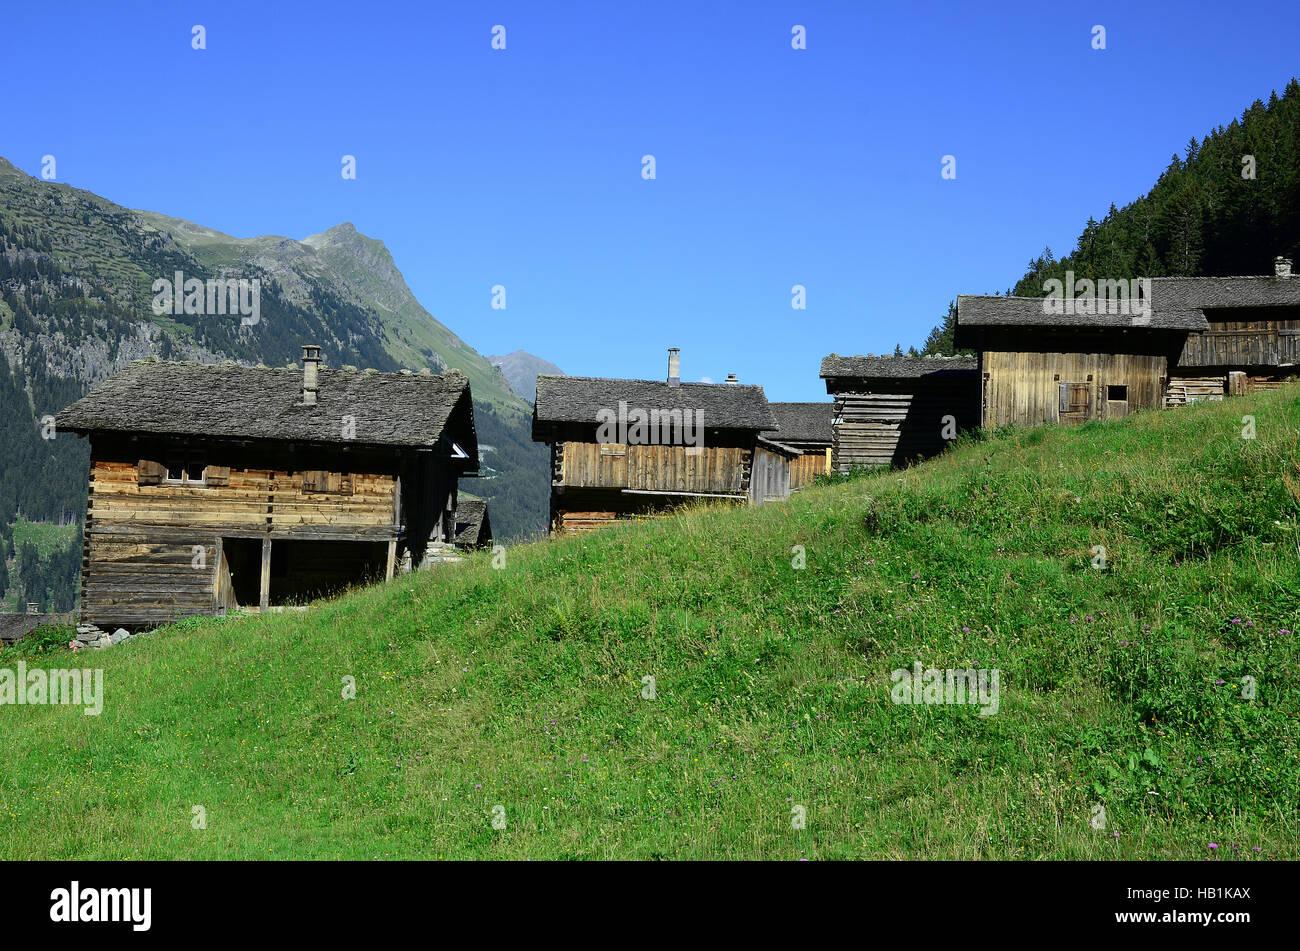 alps, hut, Austria, - Stock Image